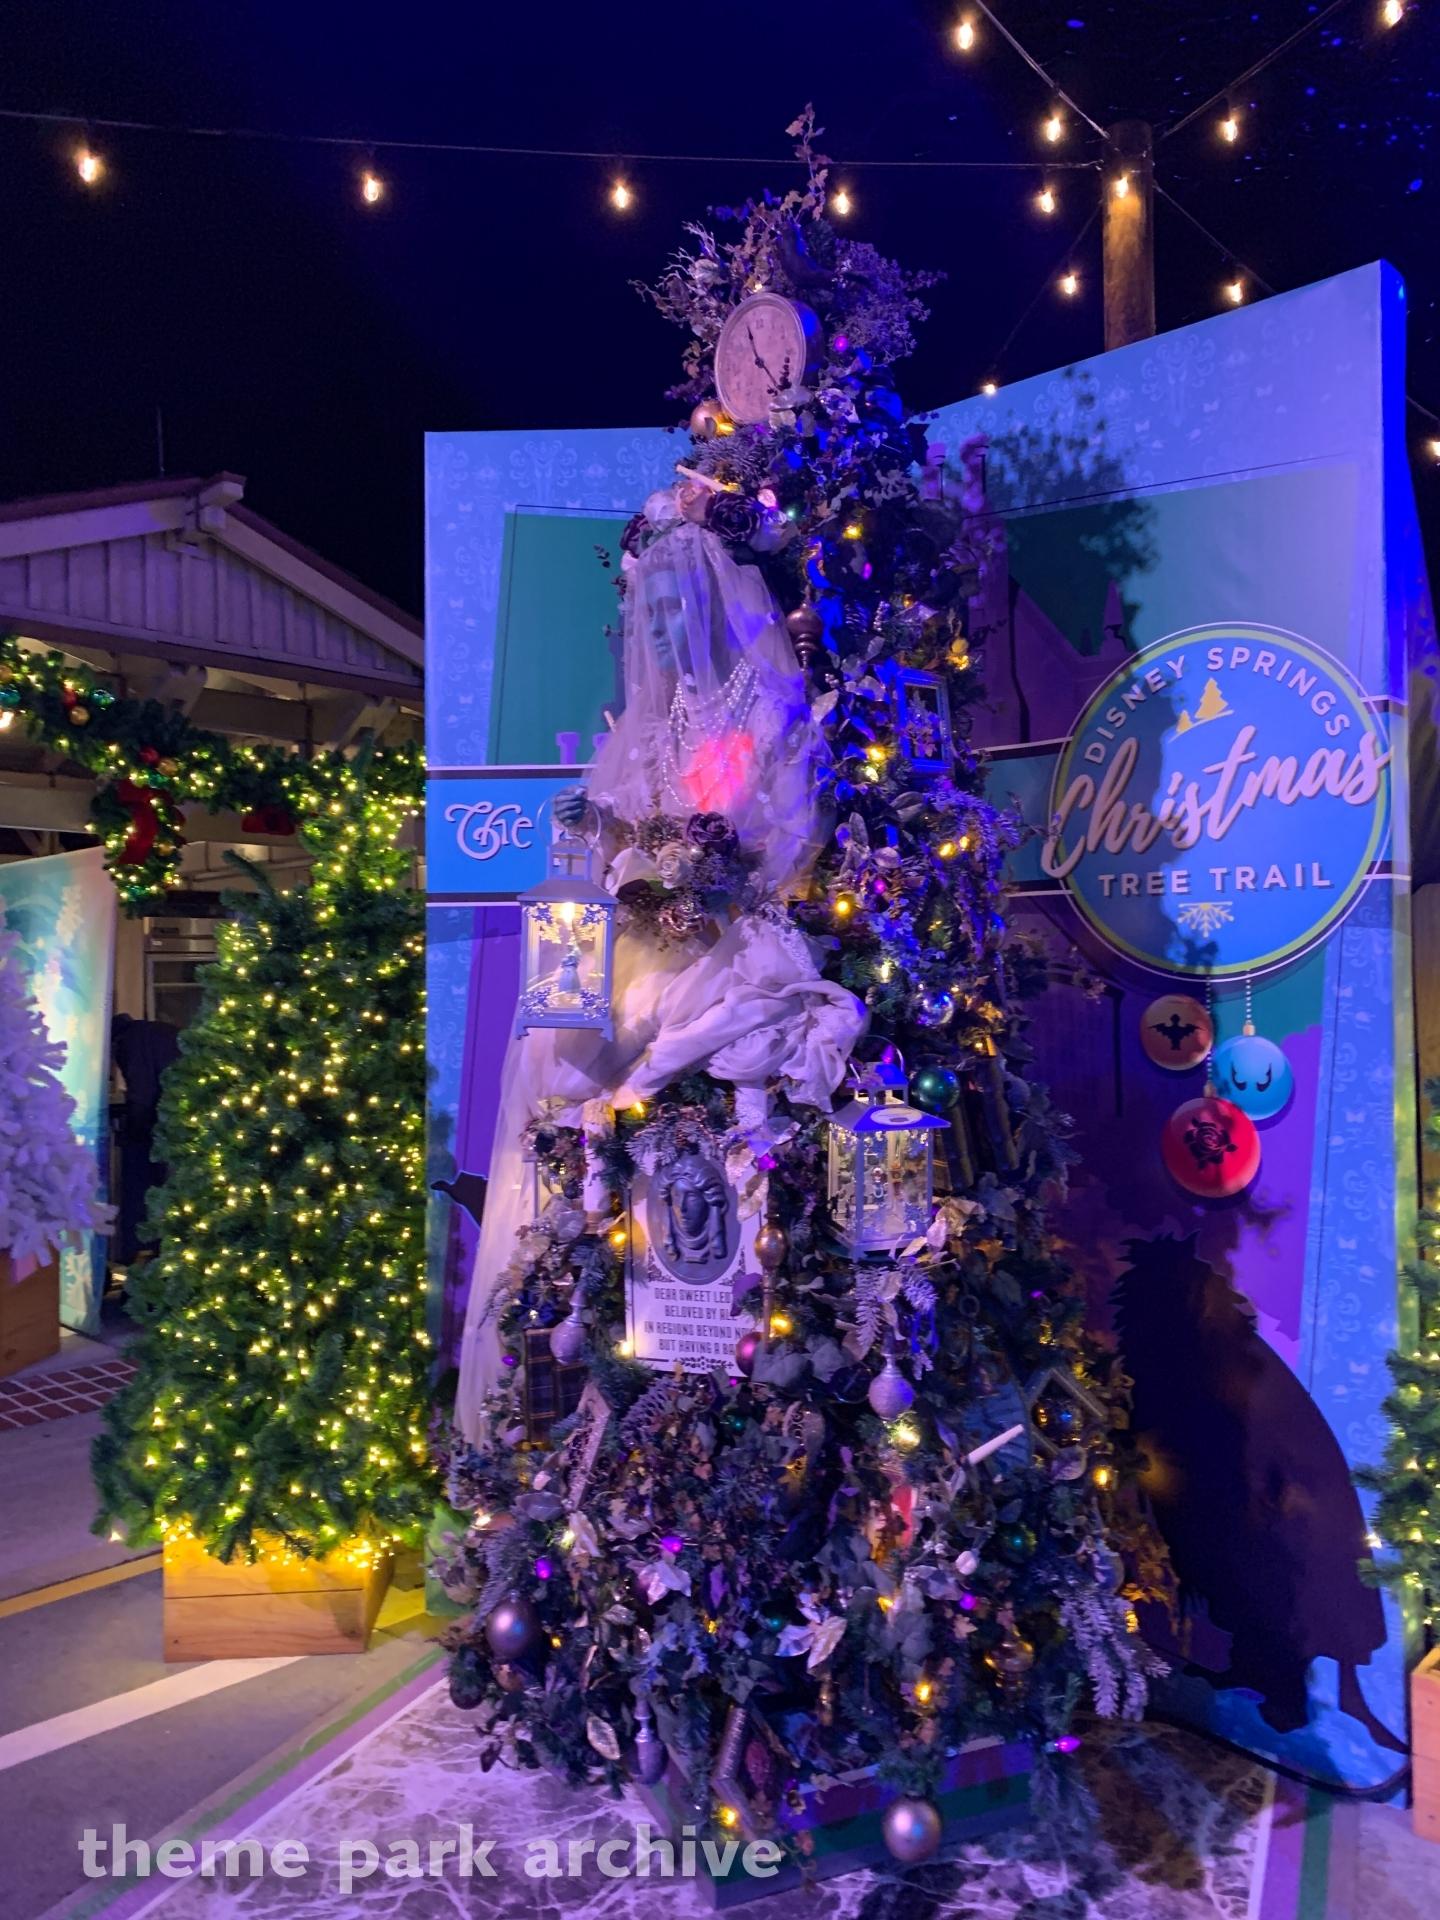 Christmas Tree Trail at Disney Springs